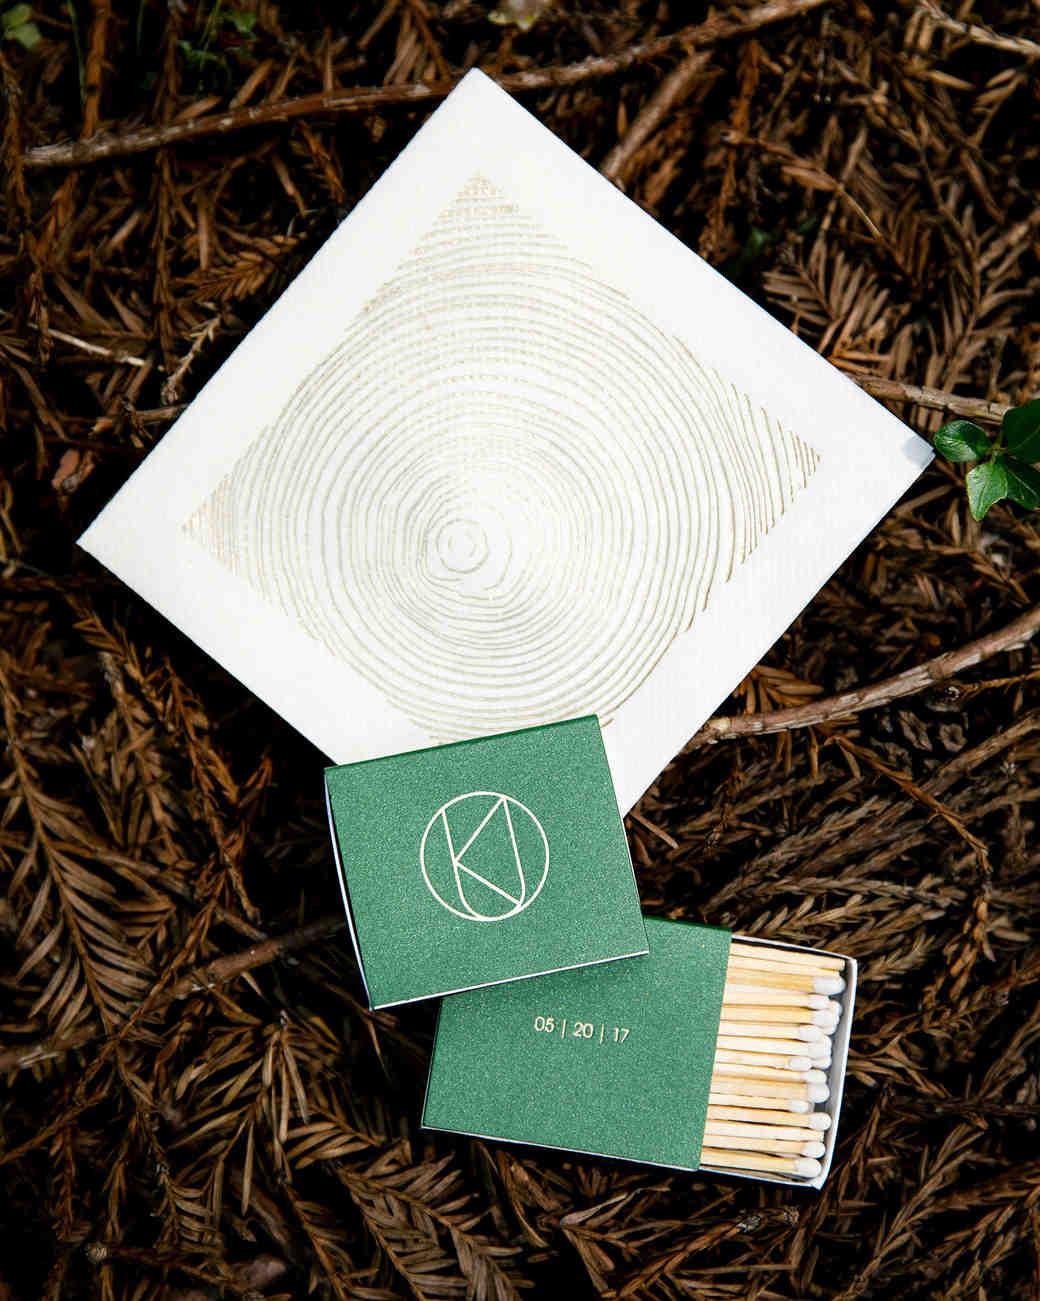 kendall jackson wedding matches and napkin